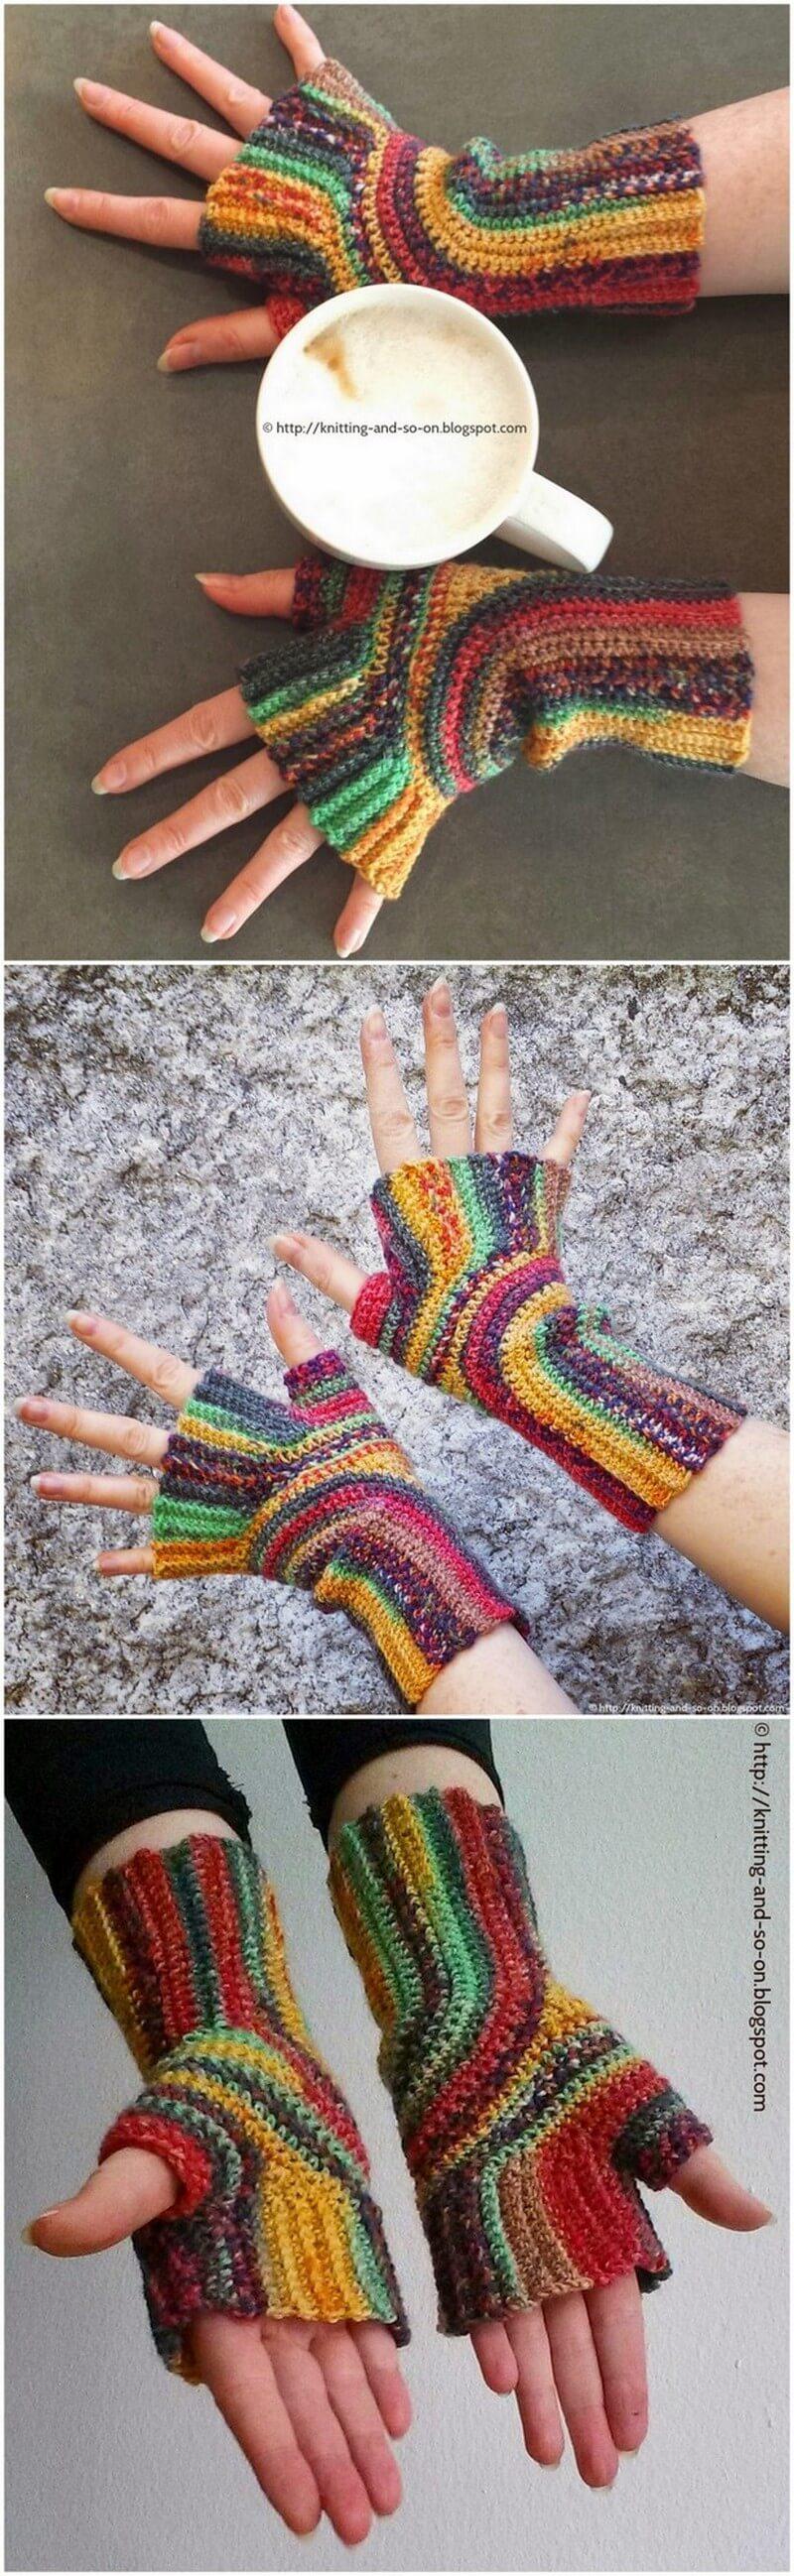 Crochet Gloves Pattern (38)